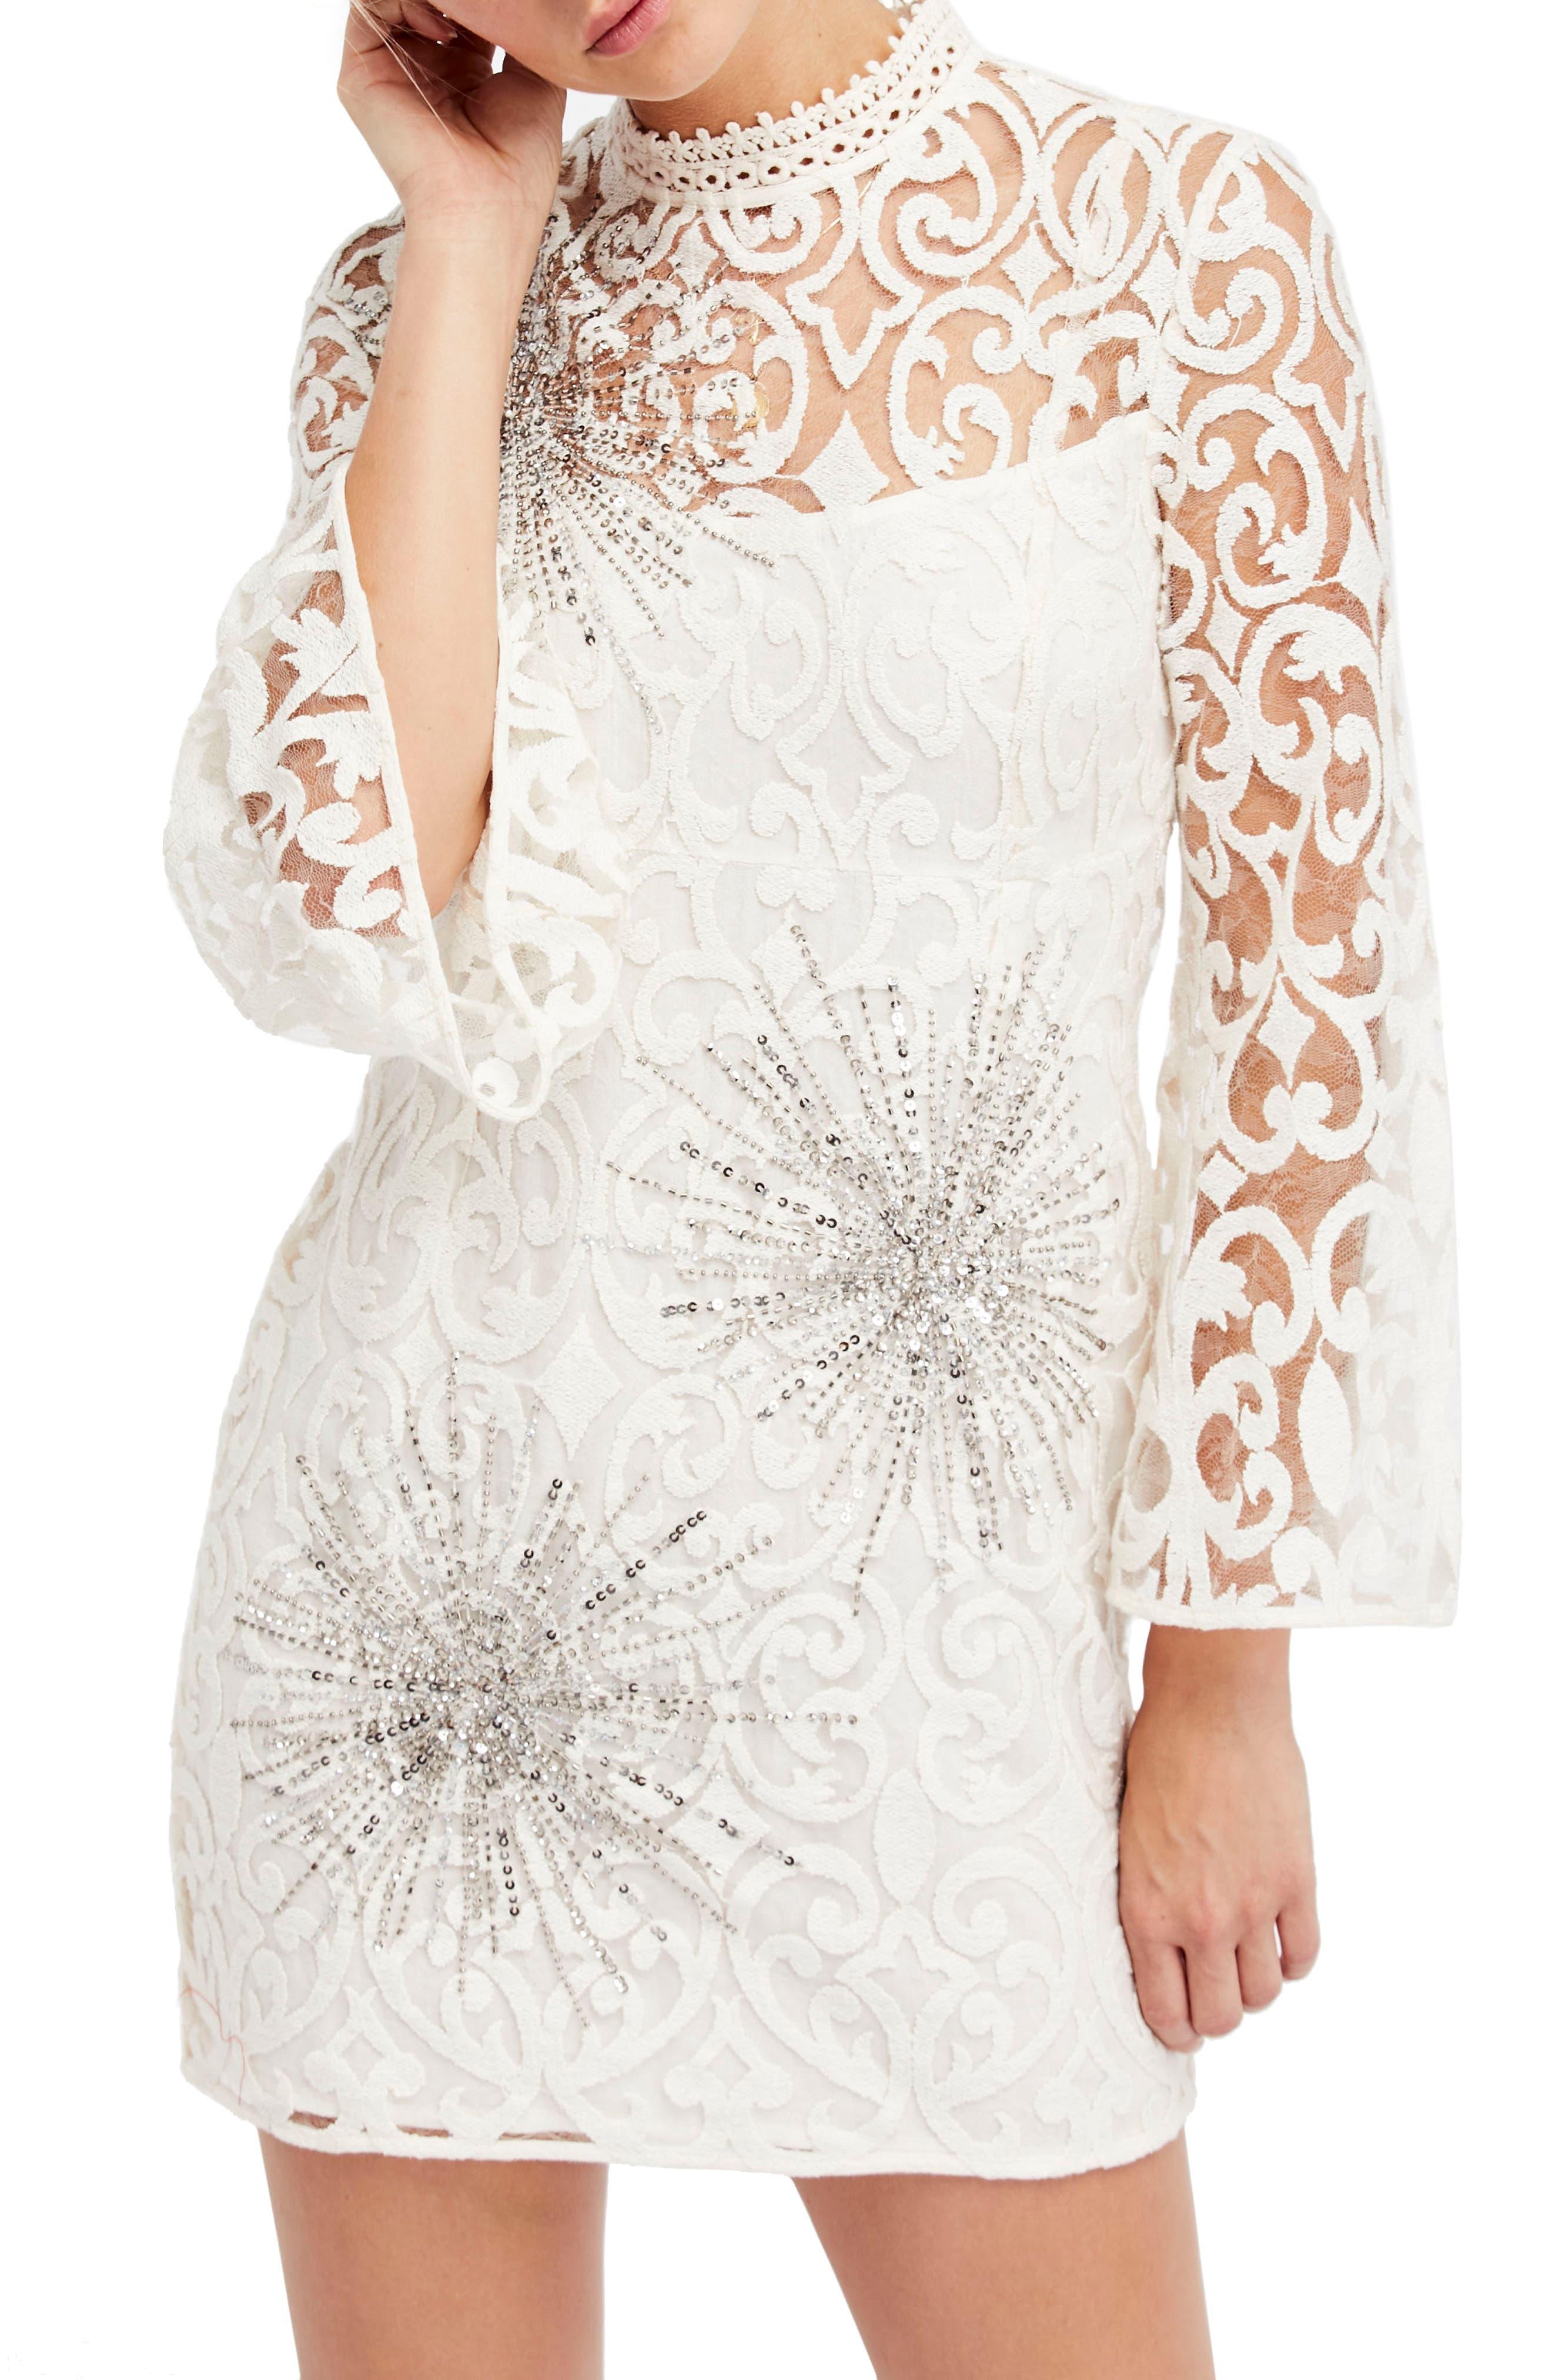 North Star Minidress,                         Main,                         color, Ivory